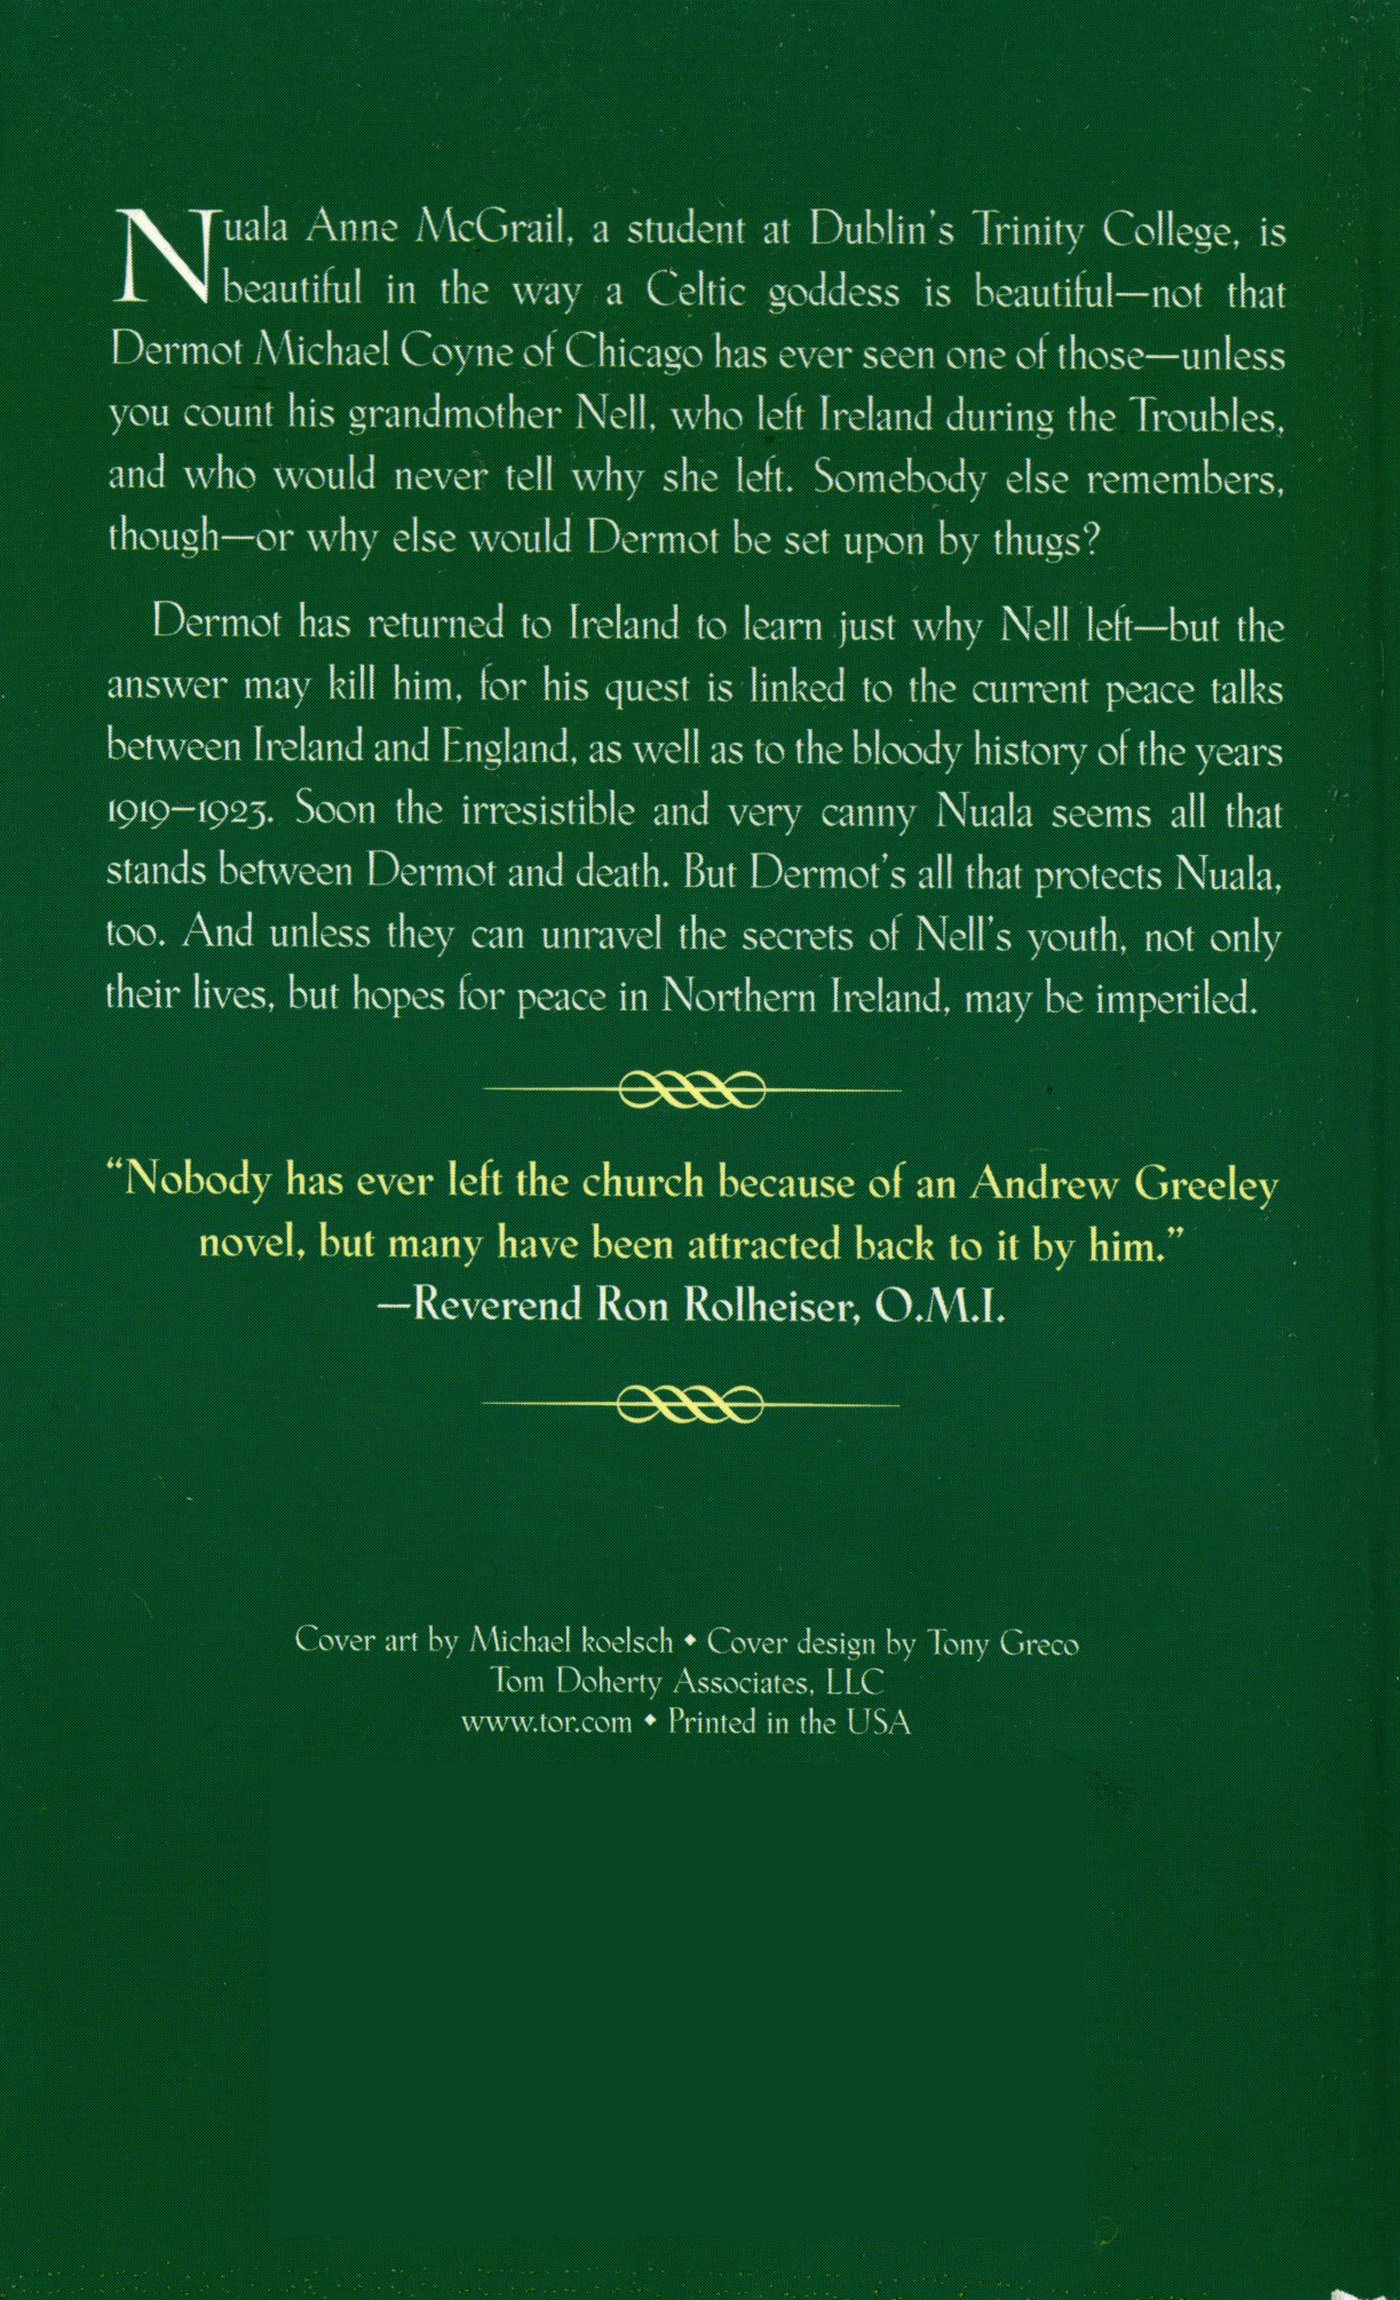 Irish Gold (Nuala Anne McGrail Novel S.): Amazon.es: Greeley ...